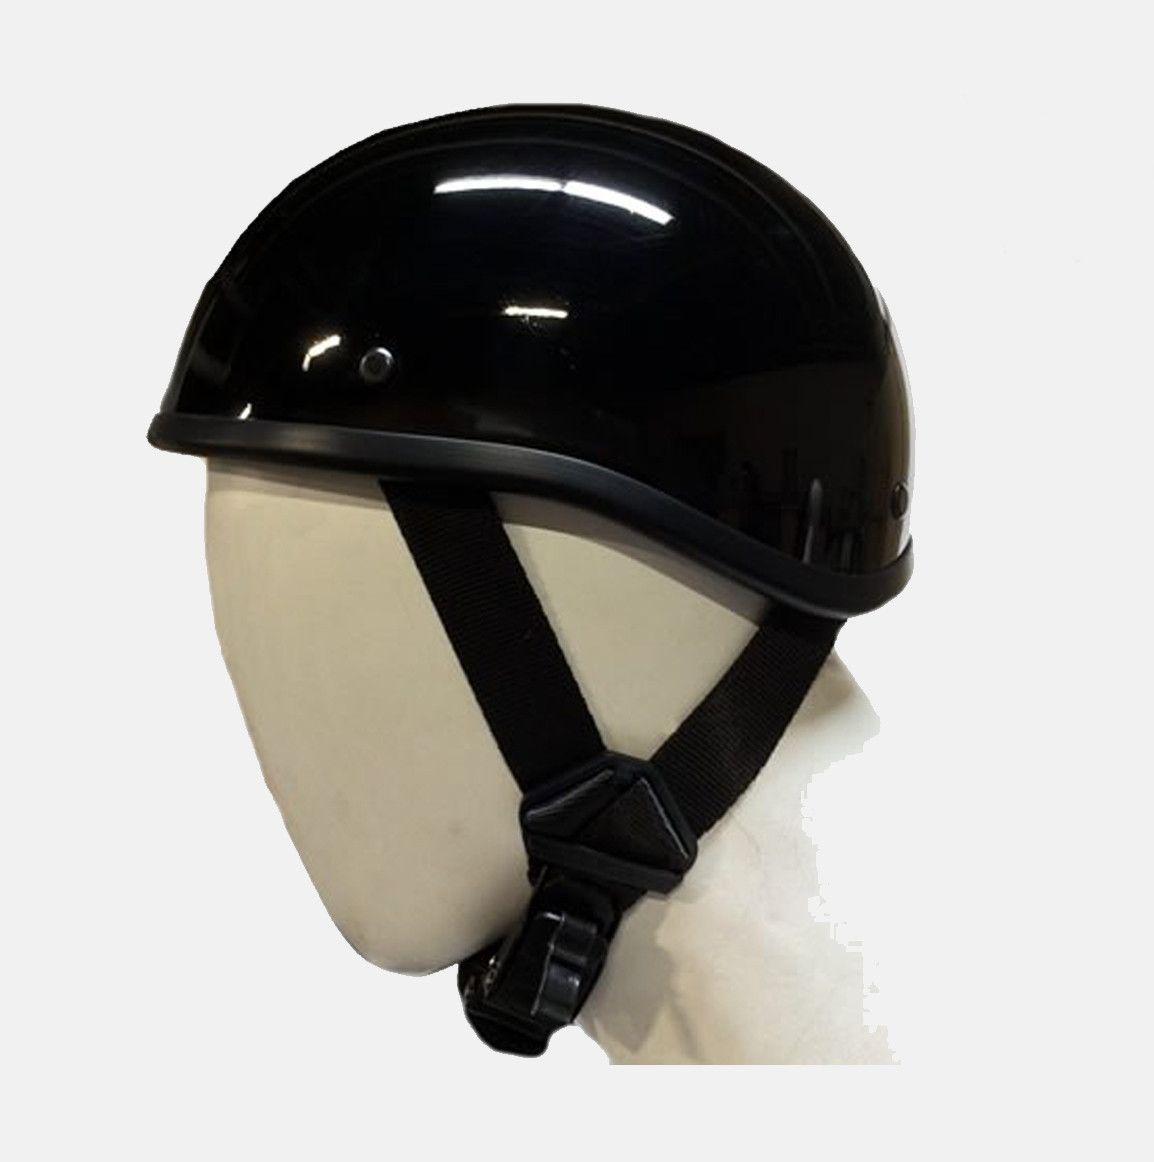 Shiny Son Of Anarchy Style Novelty Beanie Helmet Bikers Gear Online Classic Novelty Motorcycle Helmets Are A Mus Novelty Helmets Black Motorcycle Helmet Helmet